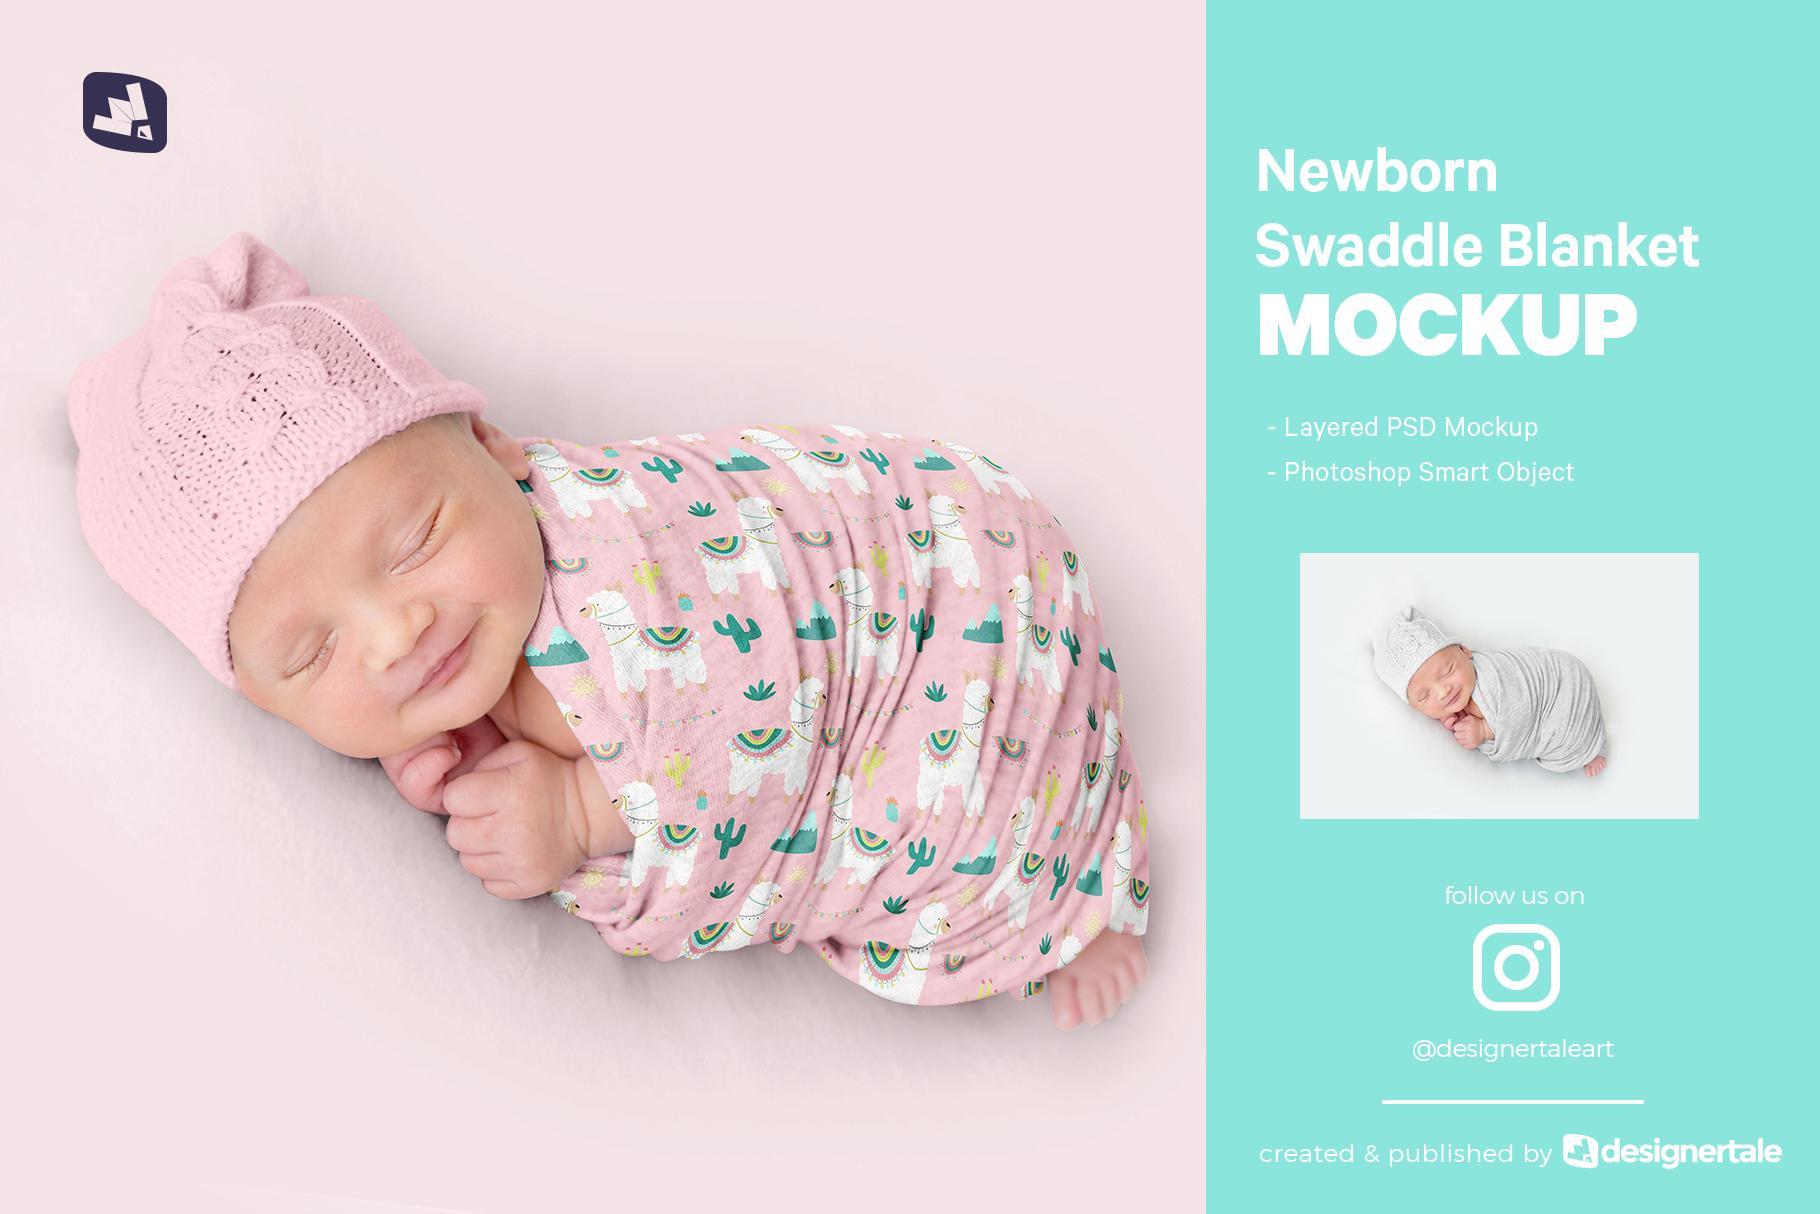 newborn swaddle blanket mockup